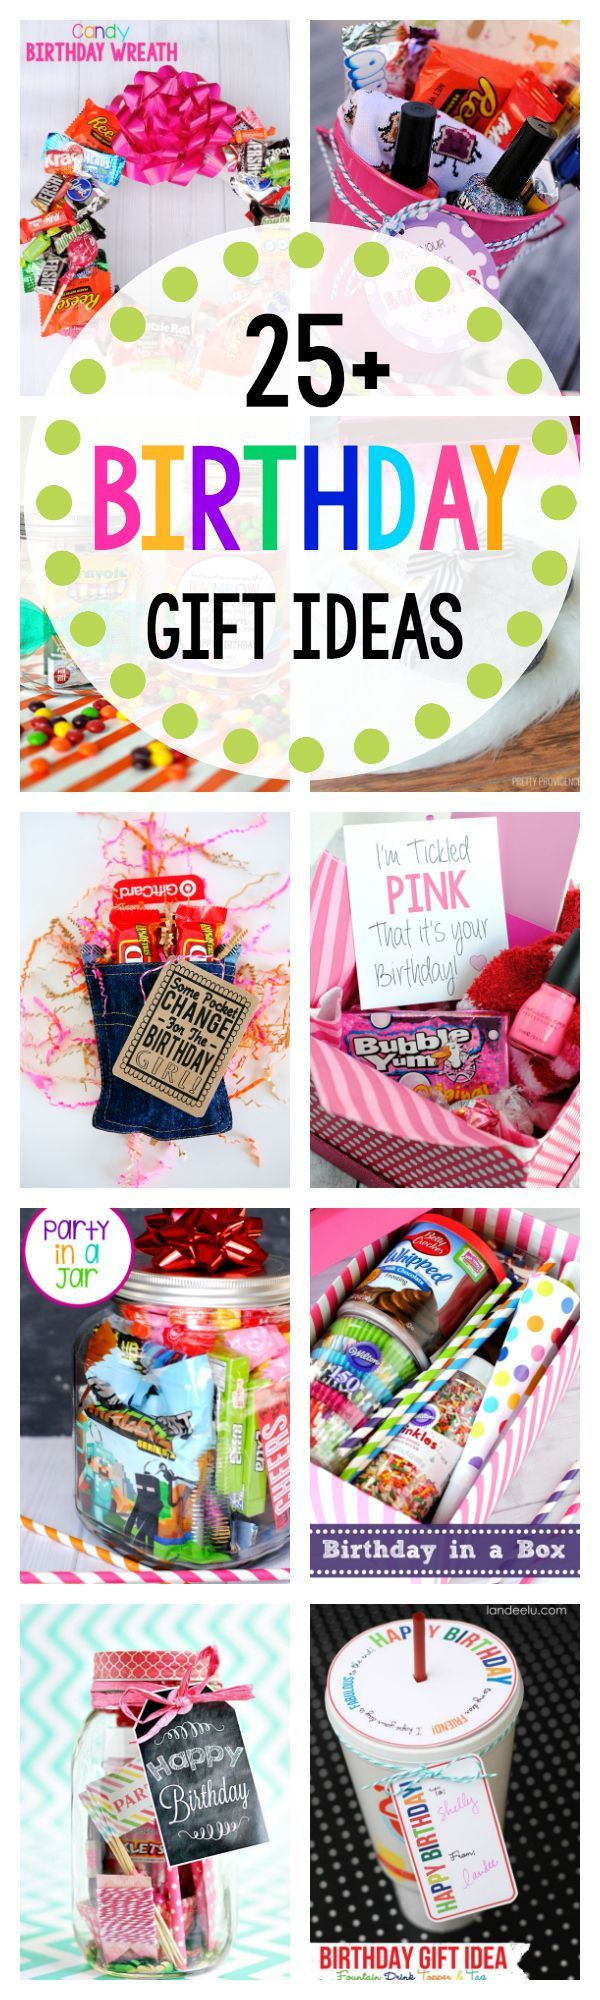 25 Amazing Fun Birthday Gift Ideas for Friends